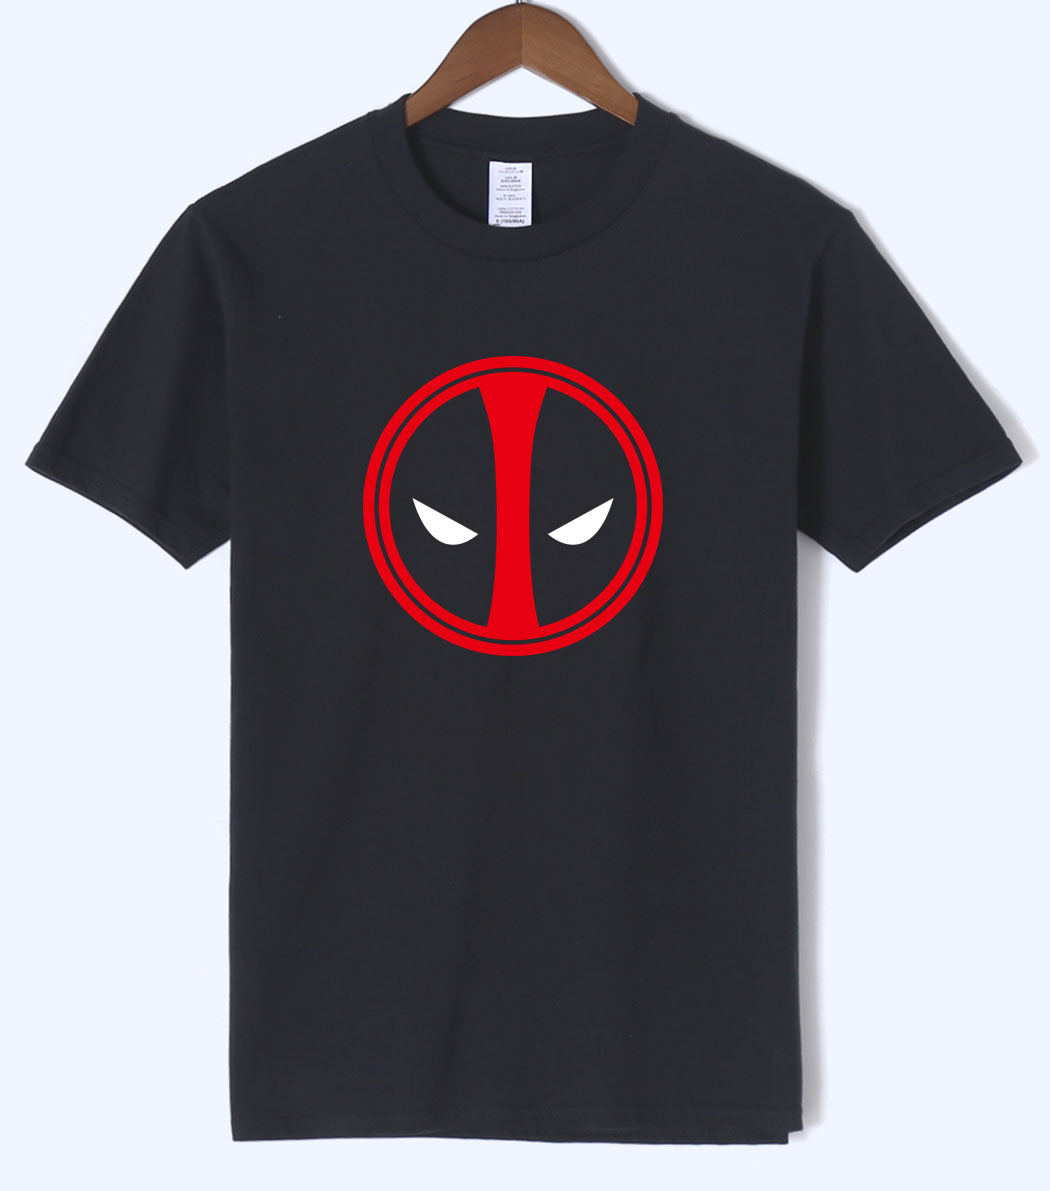 Loose Fit Deadpool Costume X-men T shirt 2018 Summer Superman Men T Shirts 100% Cotton Deadpool Short Sleeve O-neck Men T-Shirts